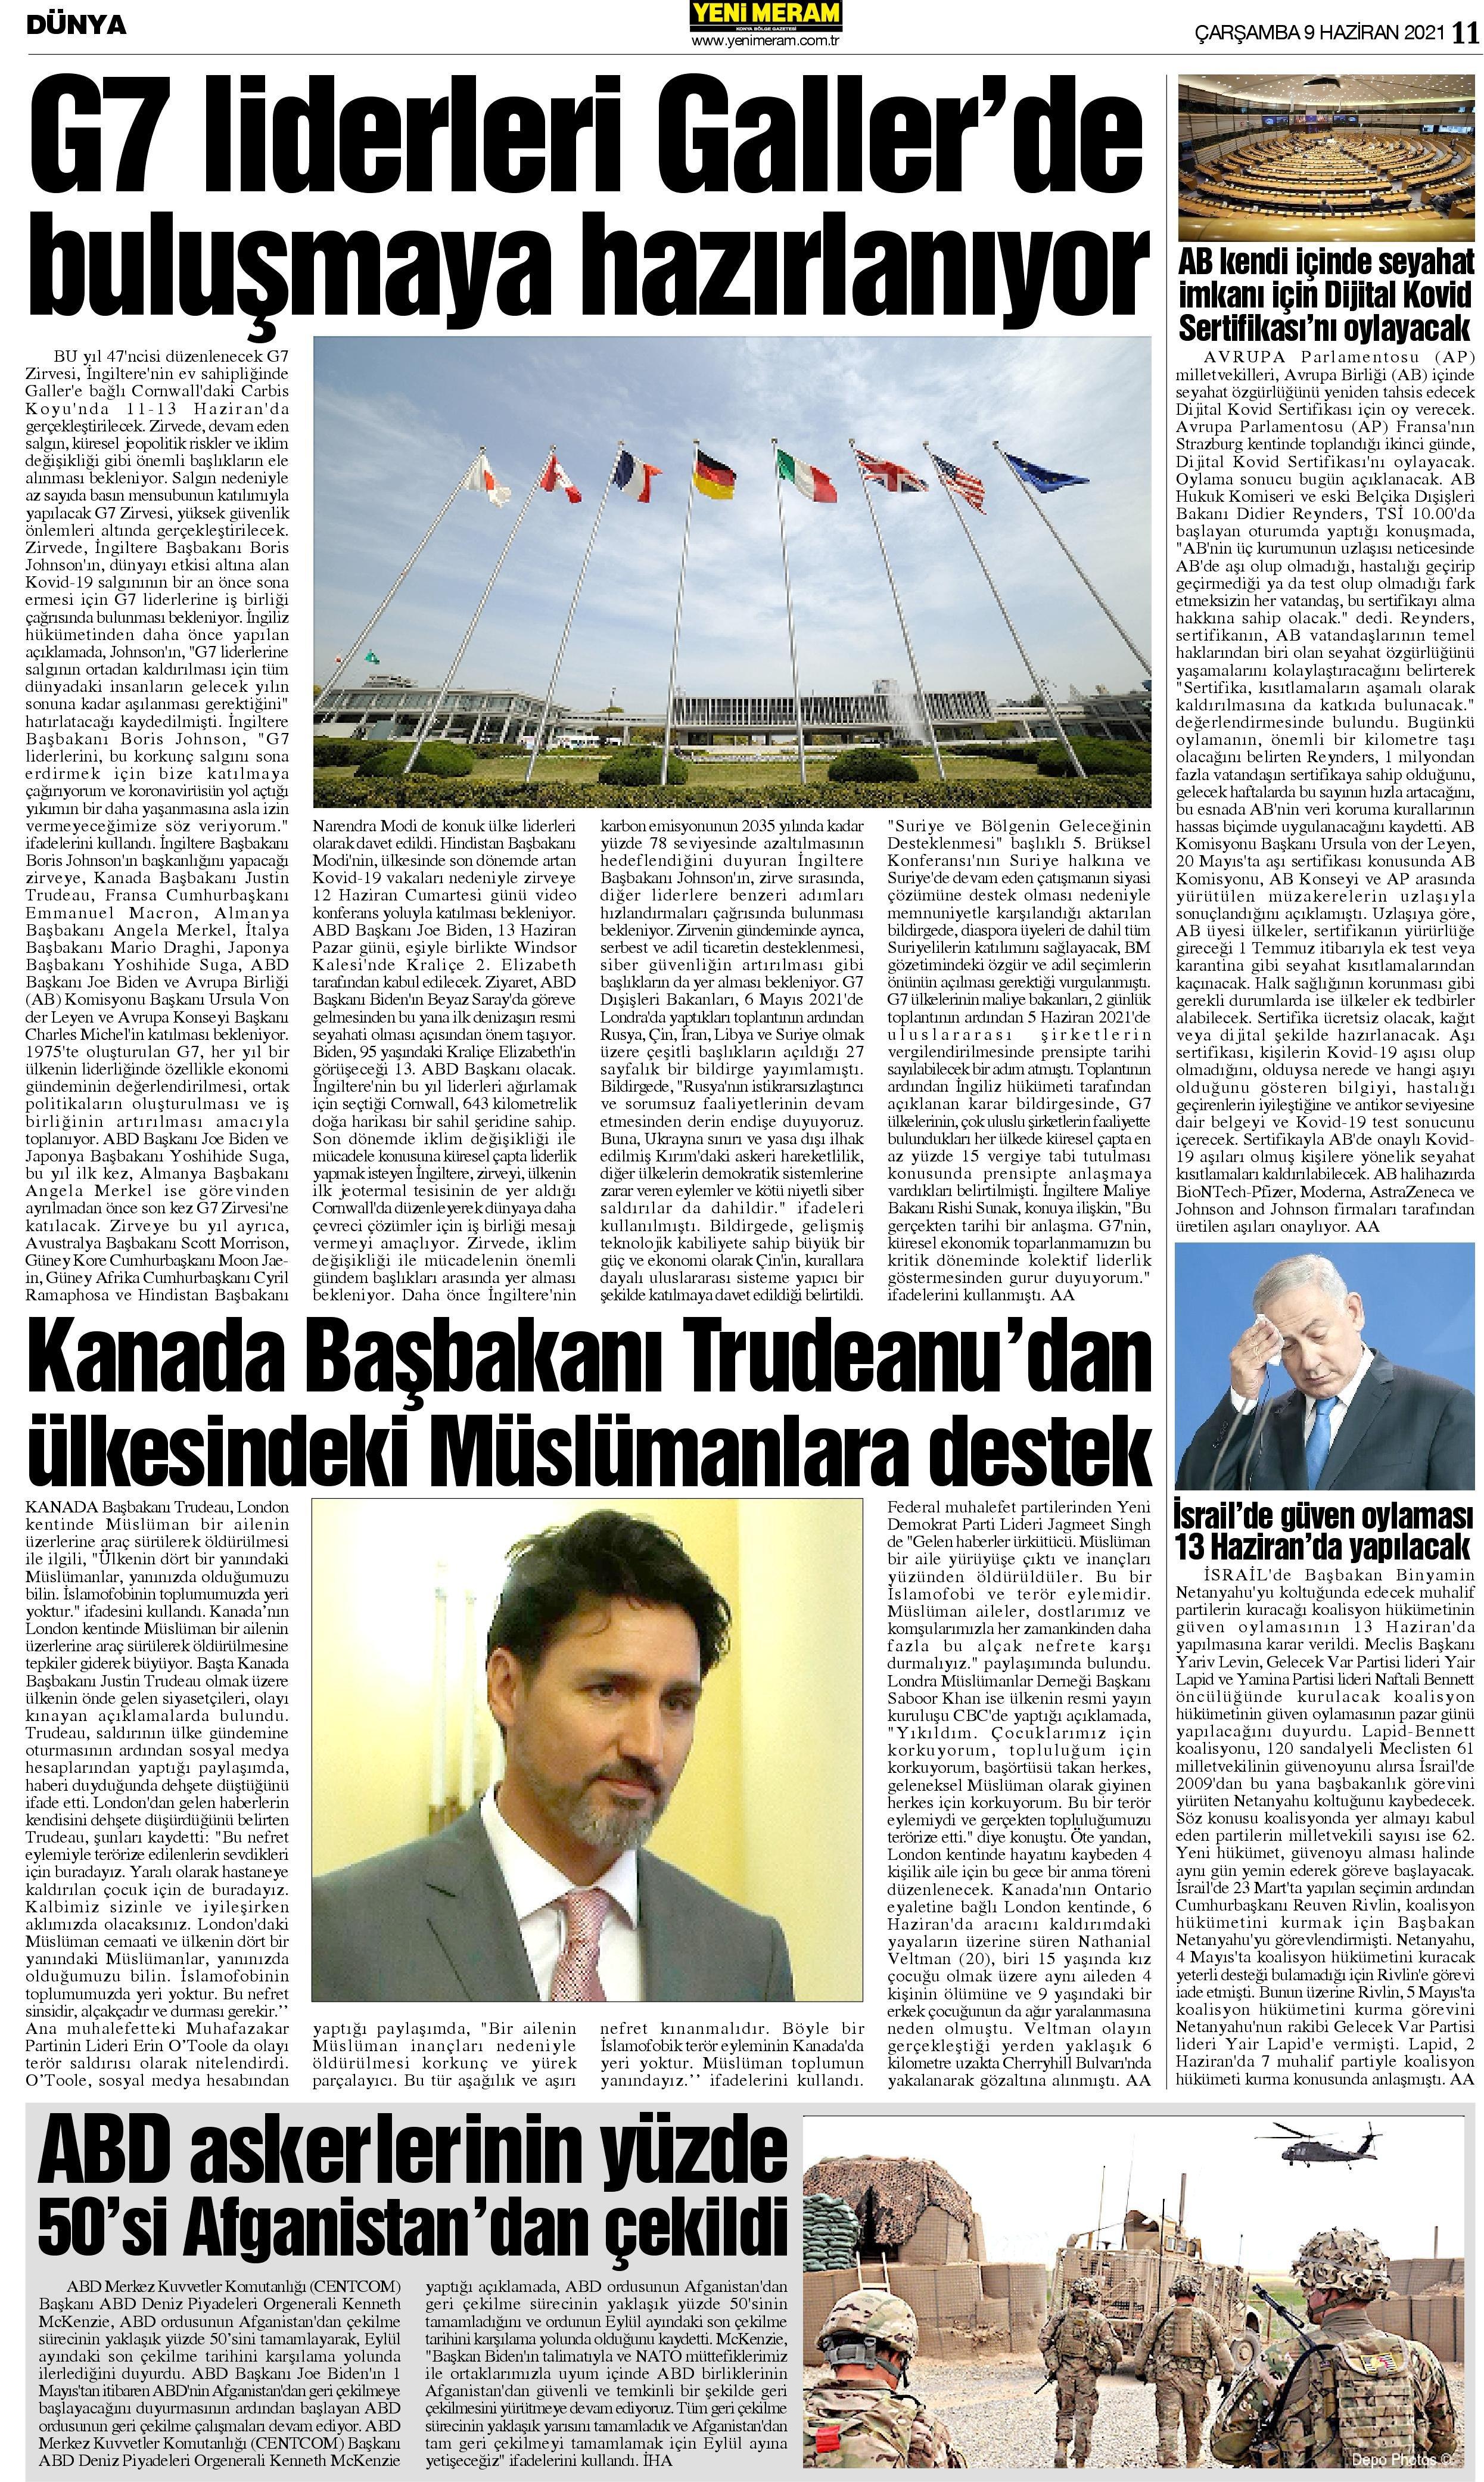 9 Haziran 2021 Yeni Meram Gazetesi